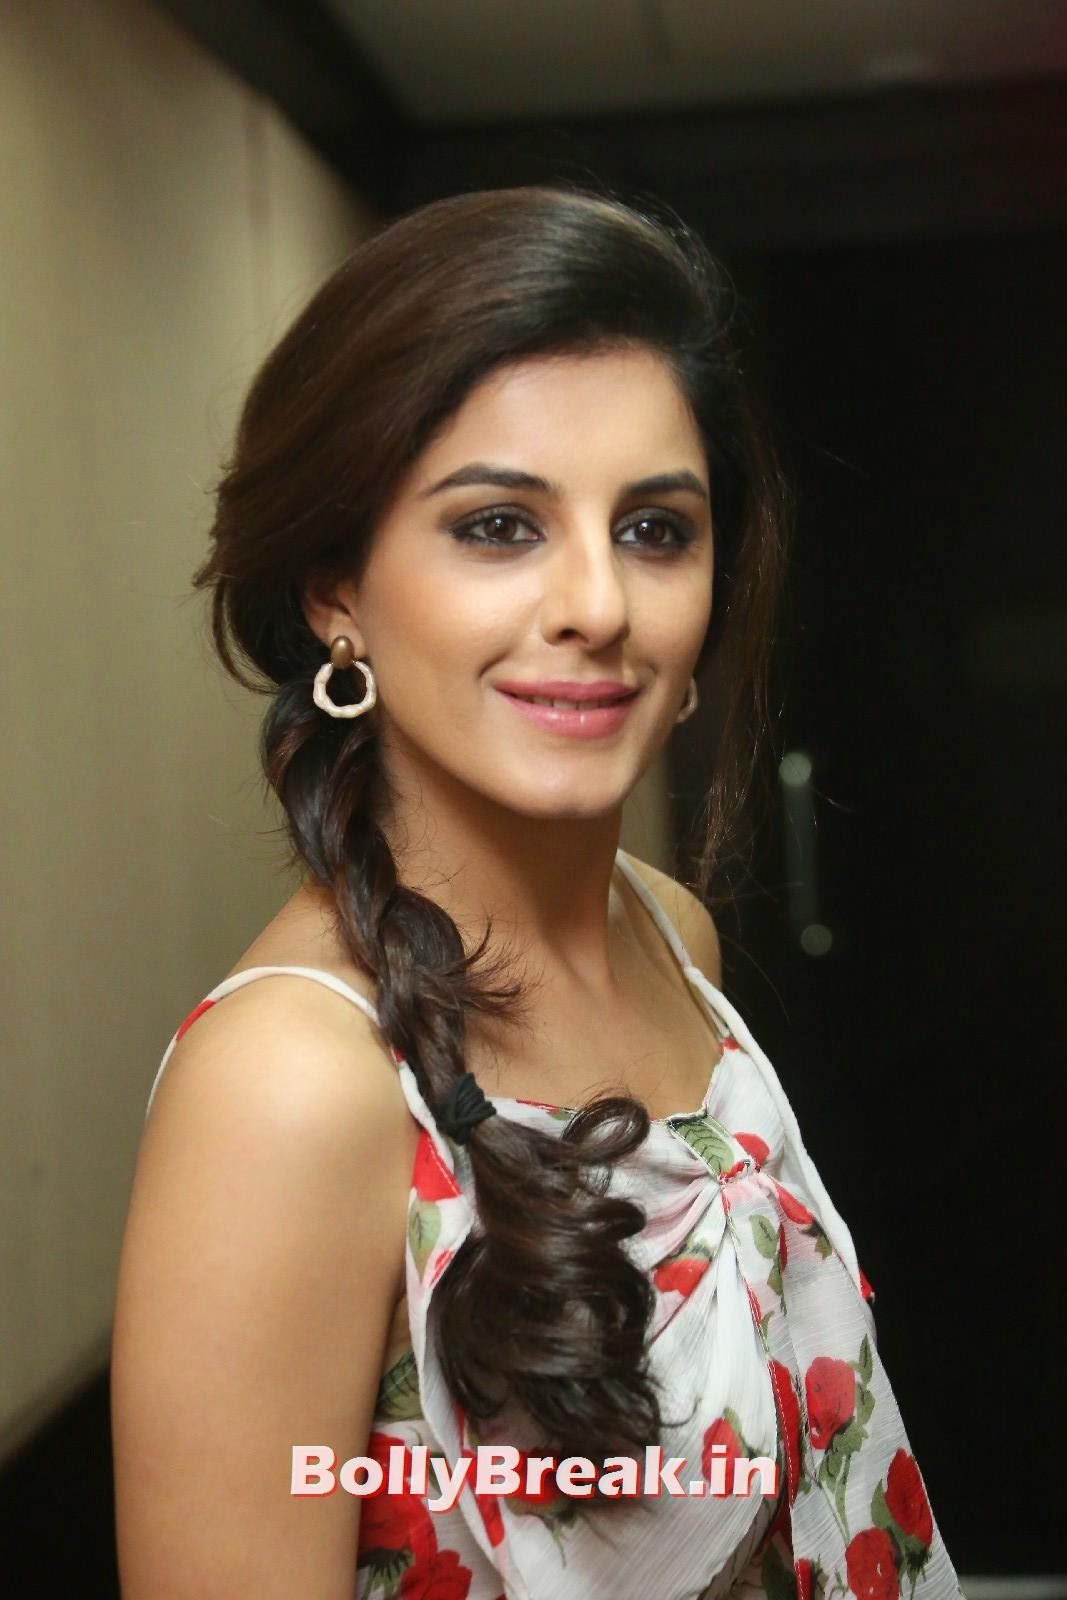 Isha Talwar (21), Isha Talwar Cute Pics - Beautiful South Actress